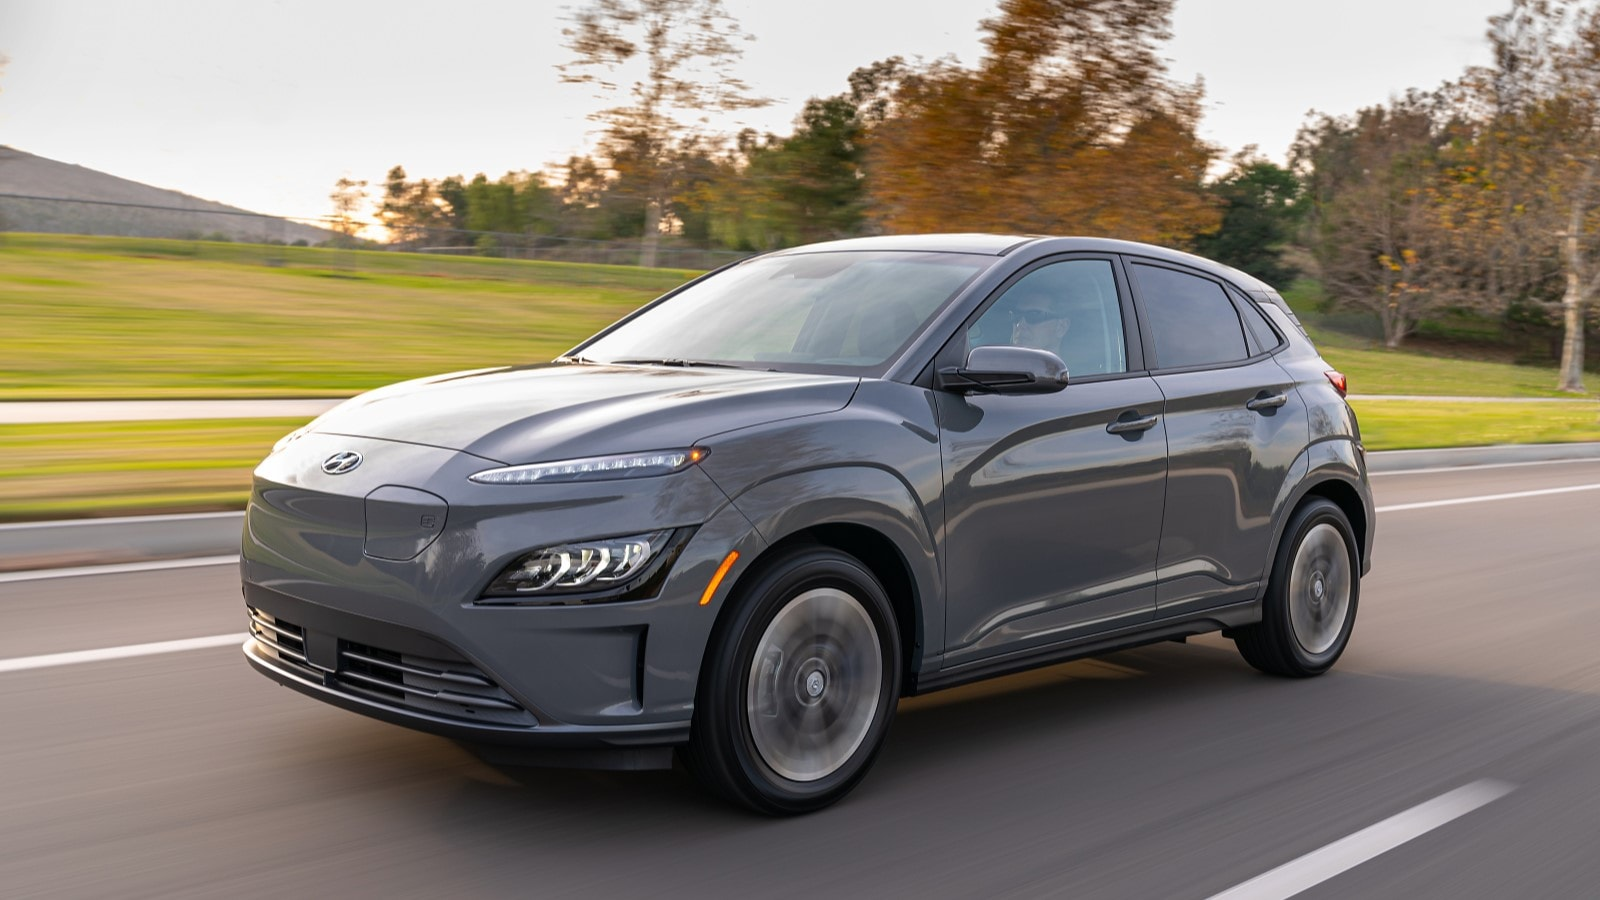 2022 Hyundai Kona Electric in grey